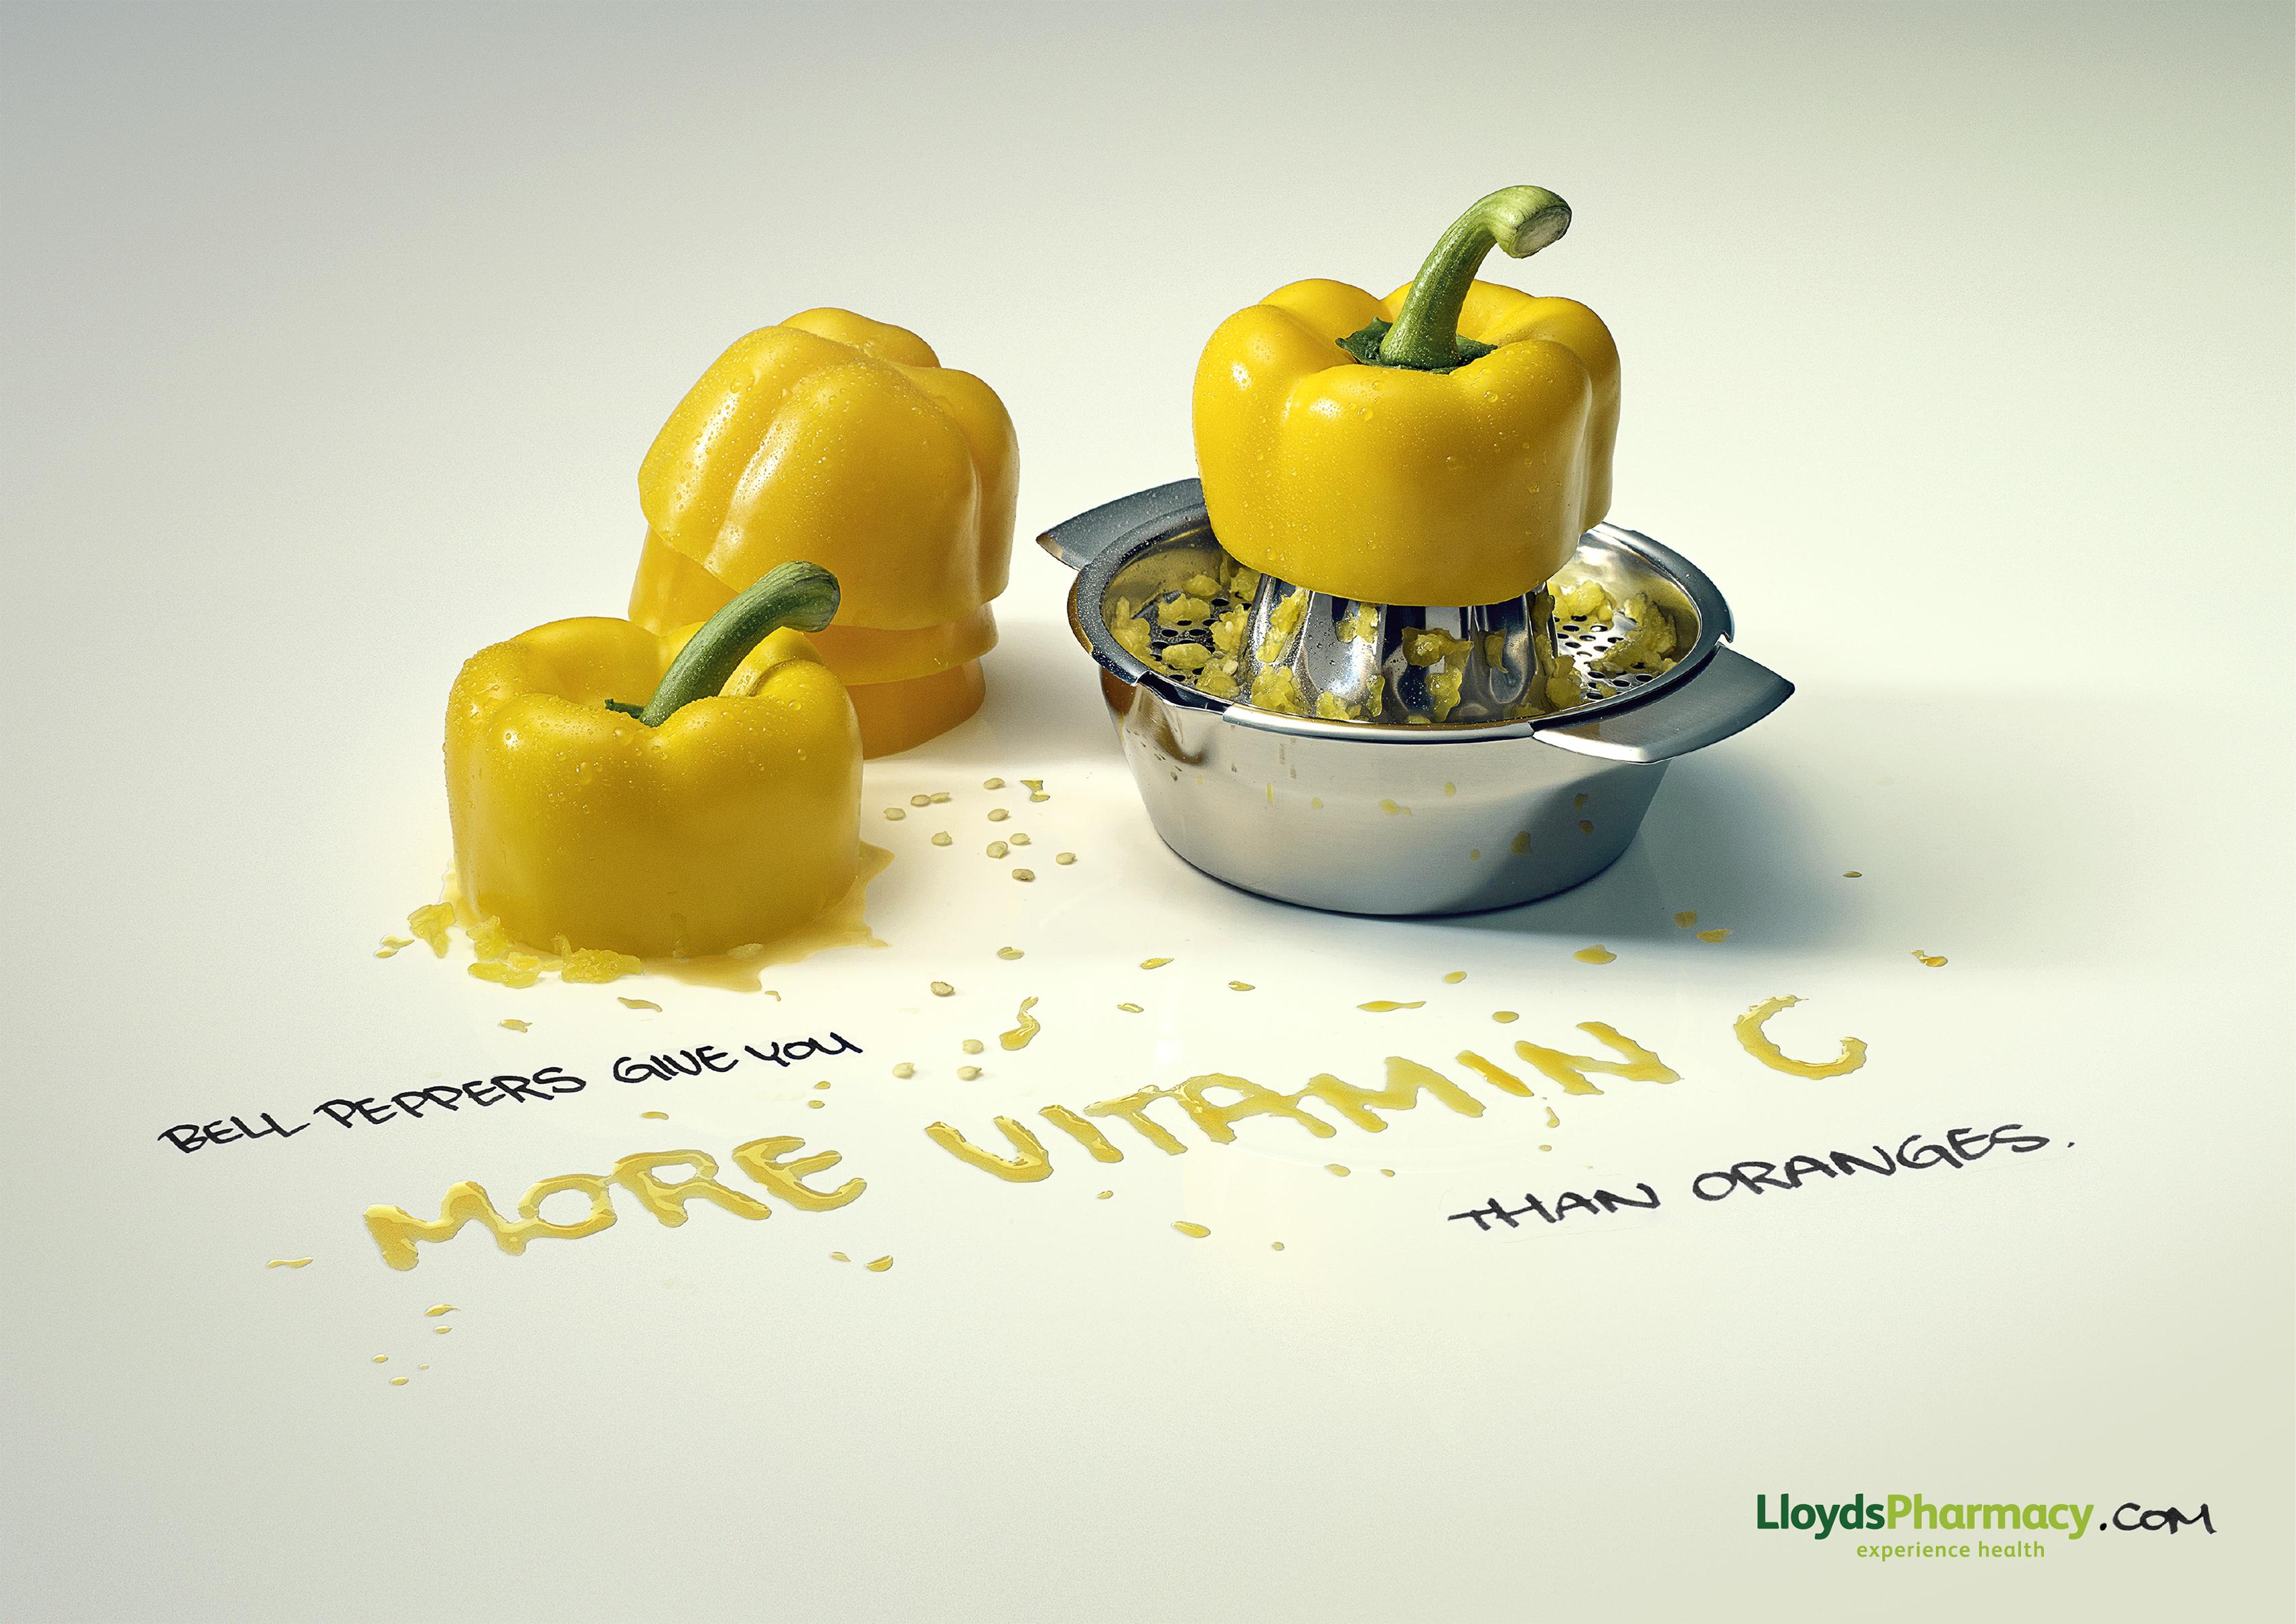 Print Ad Lloyds Pharmacy Oranges